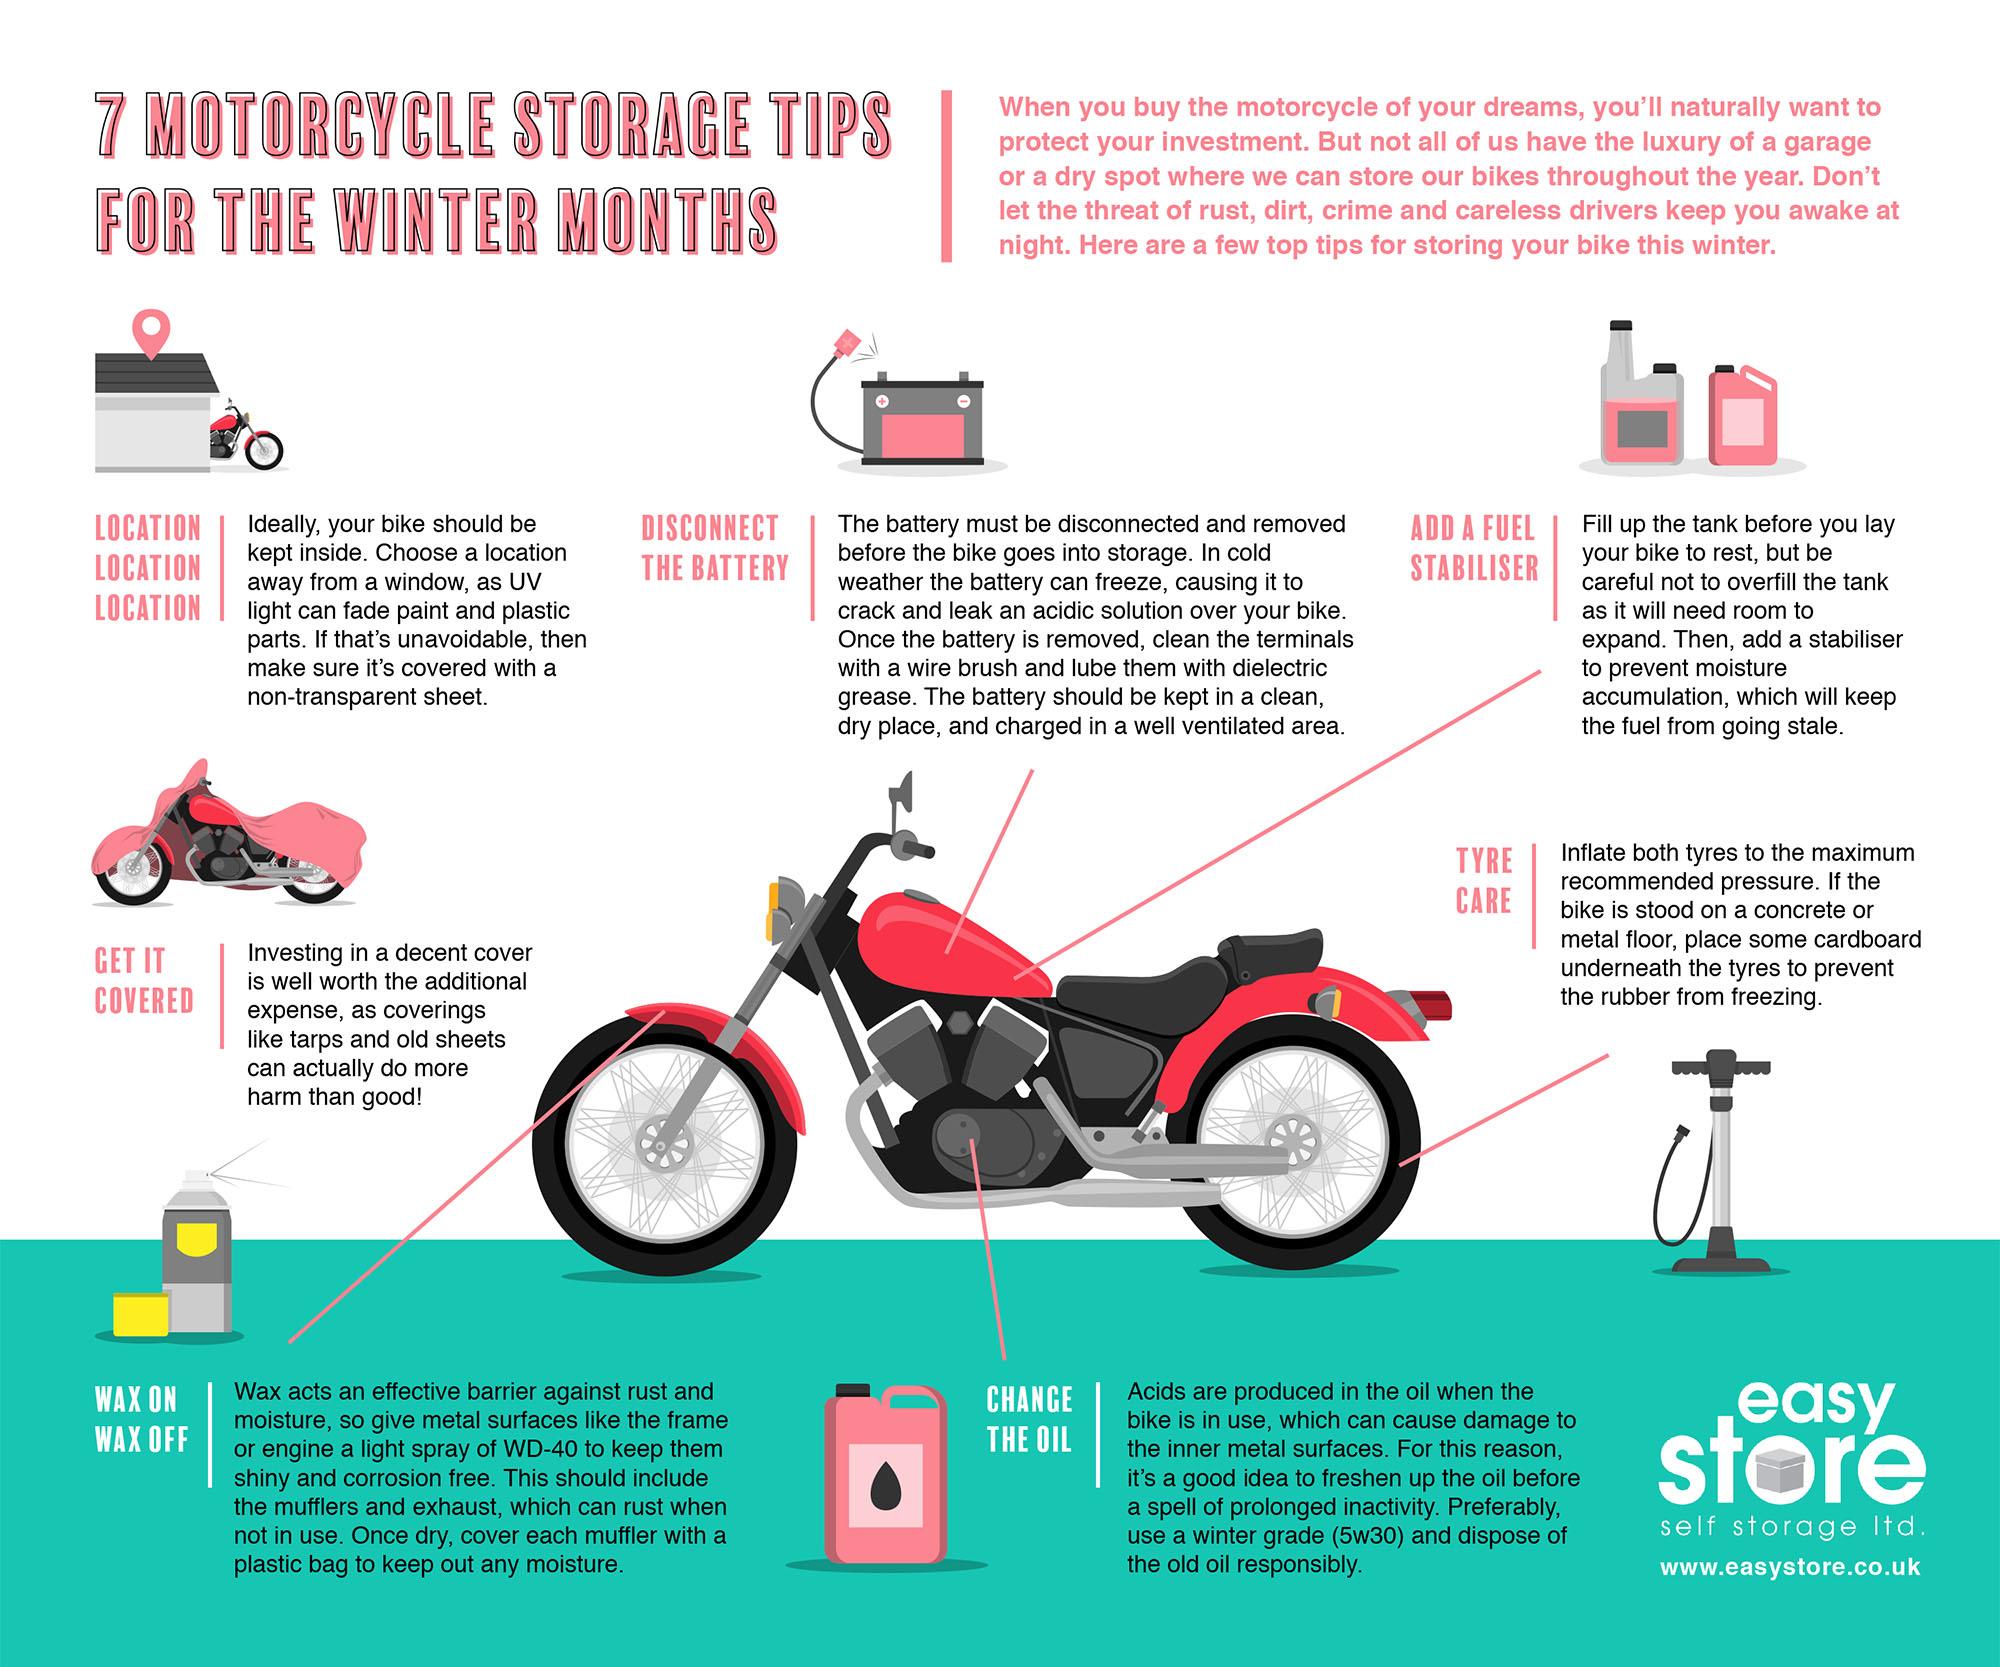 Easystore Motorbike Infographic